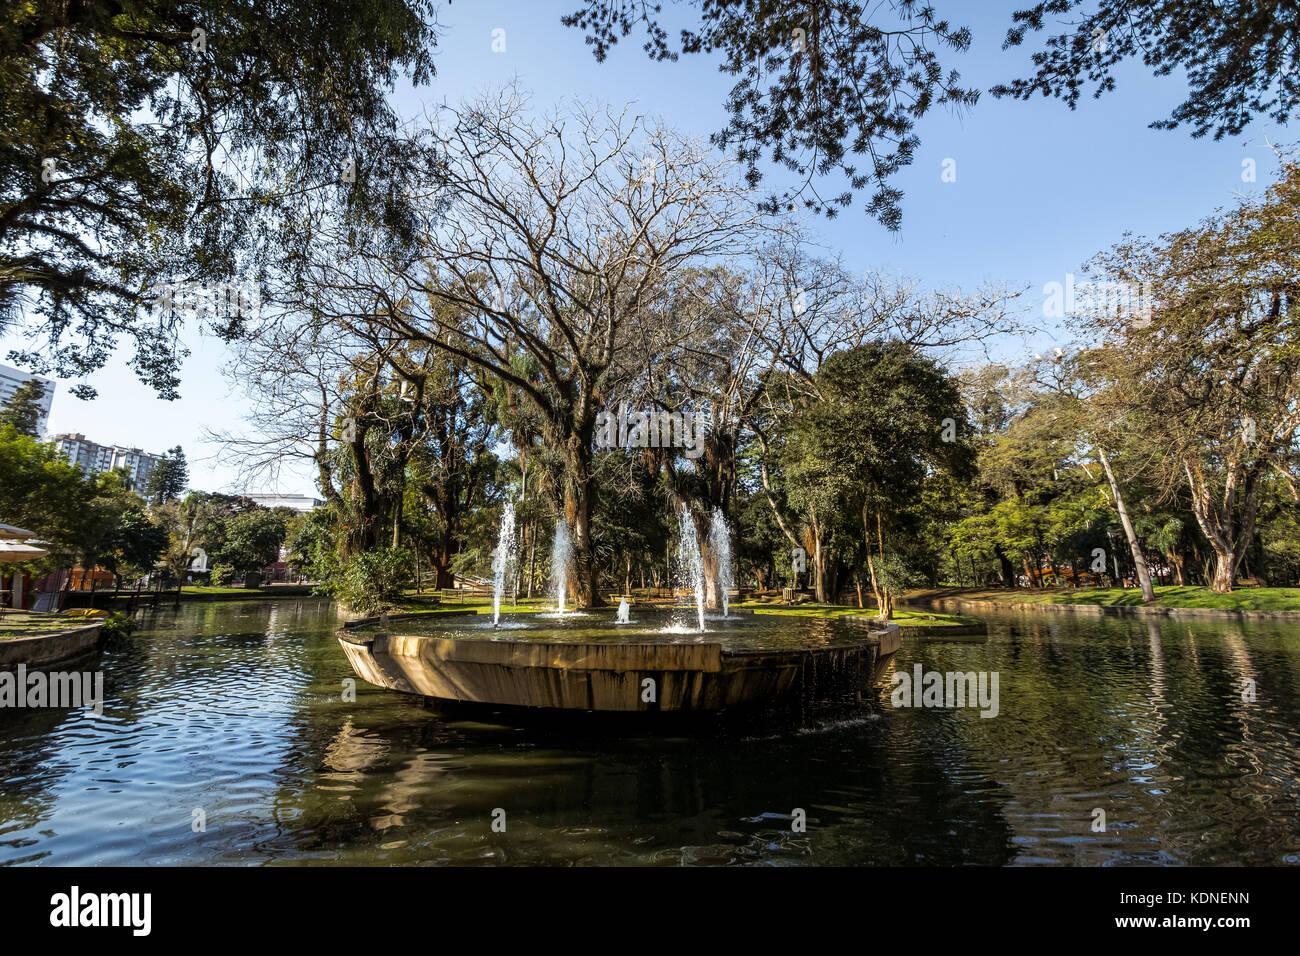 Passeio Publico Park - Curitiba, Parana, Brazil - Stock Image